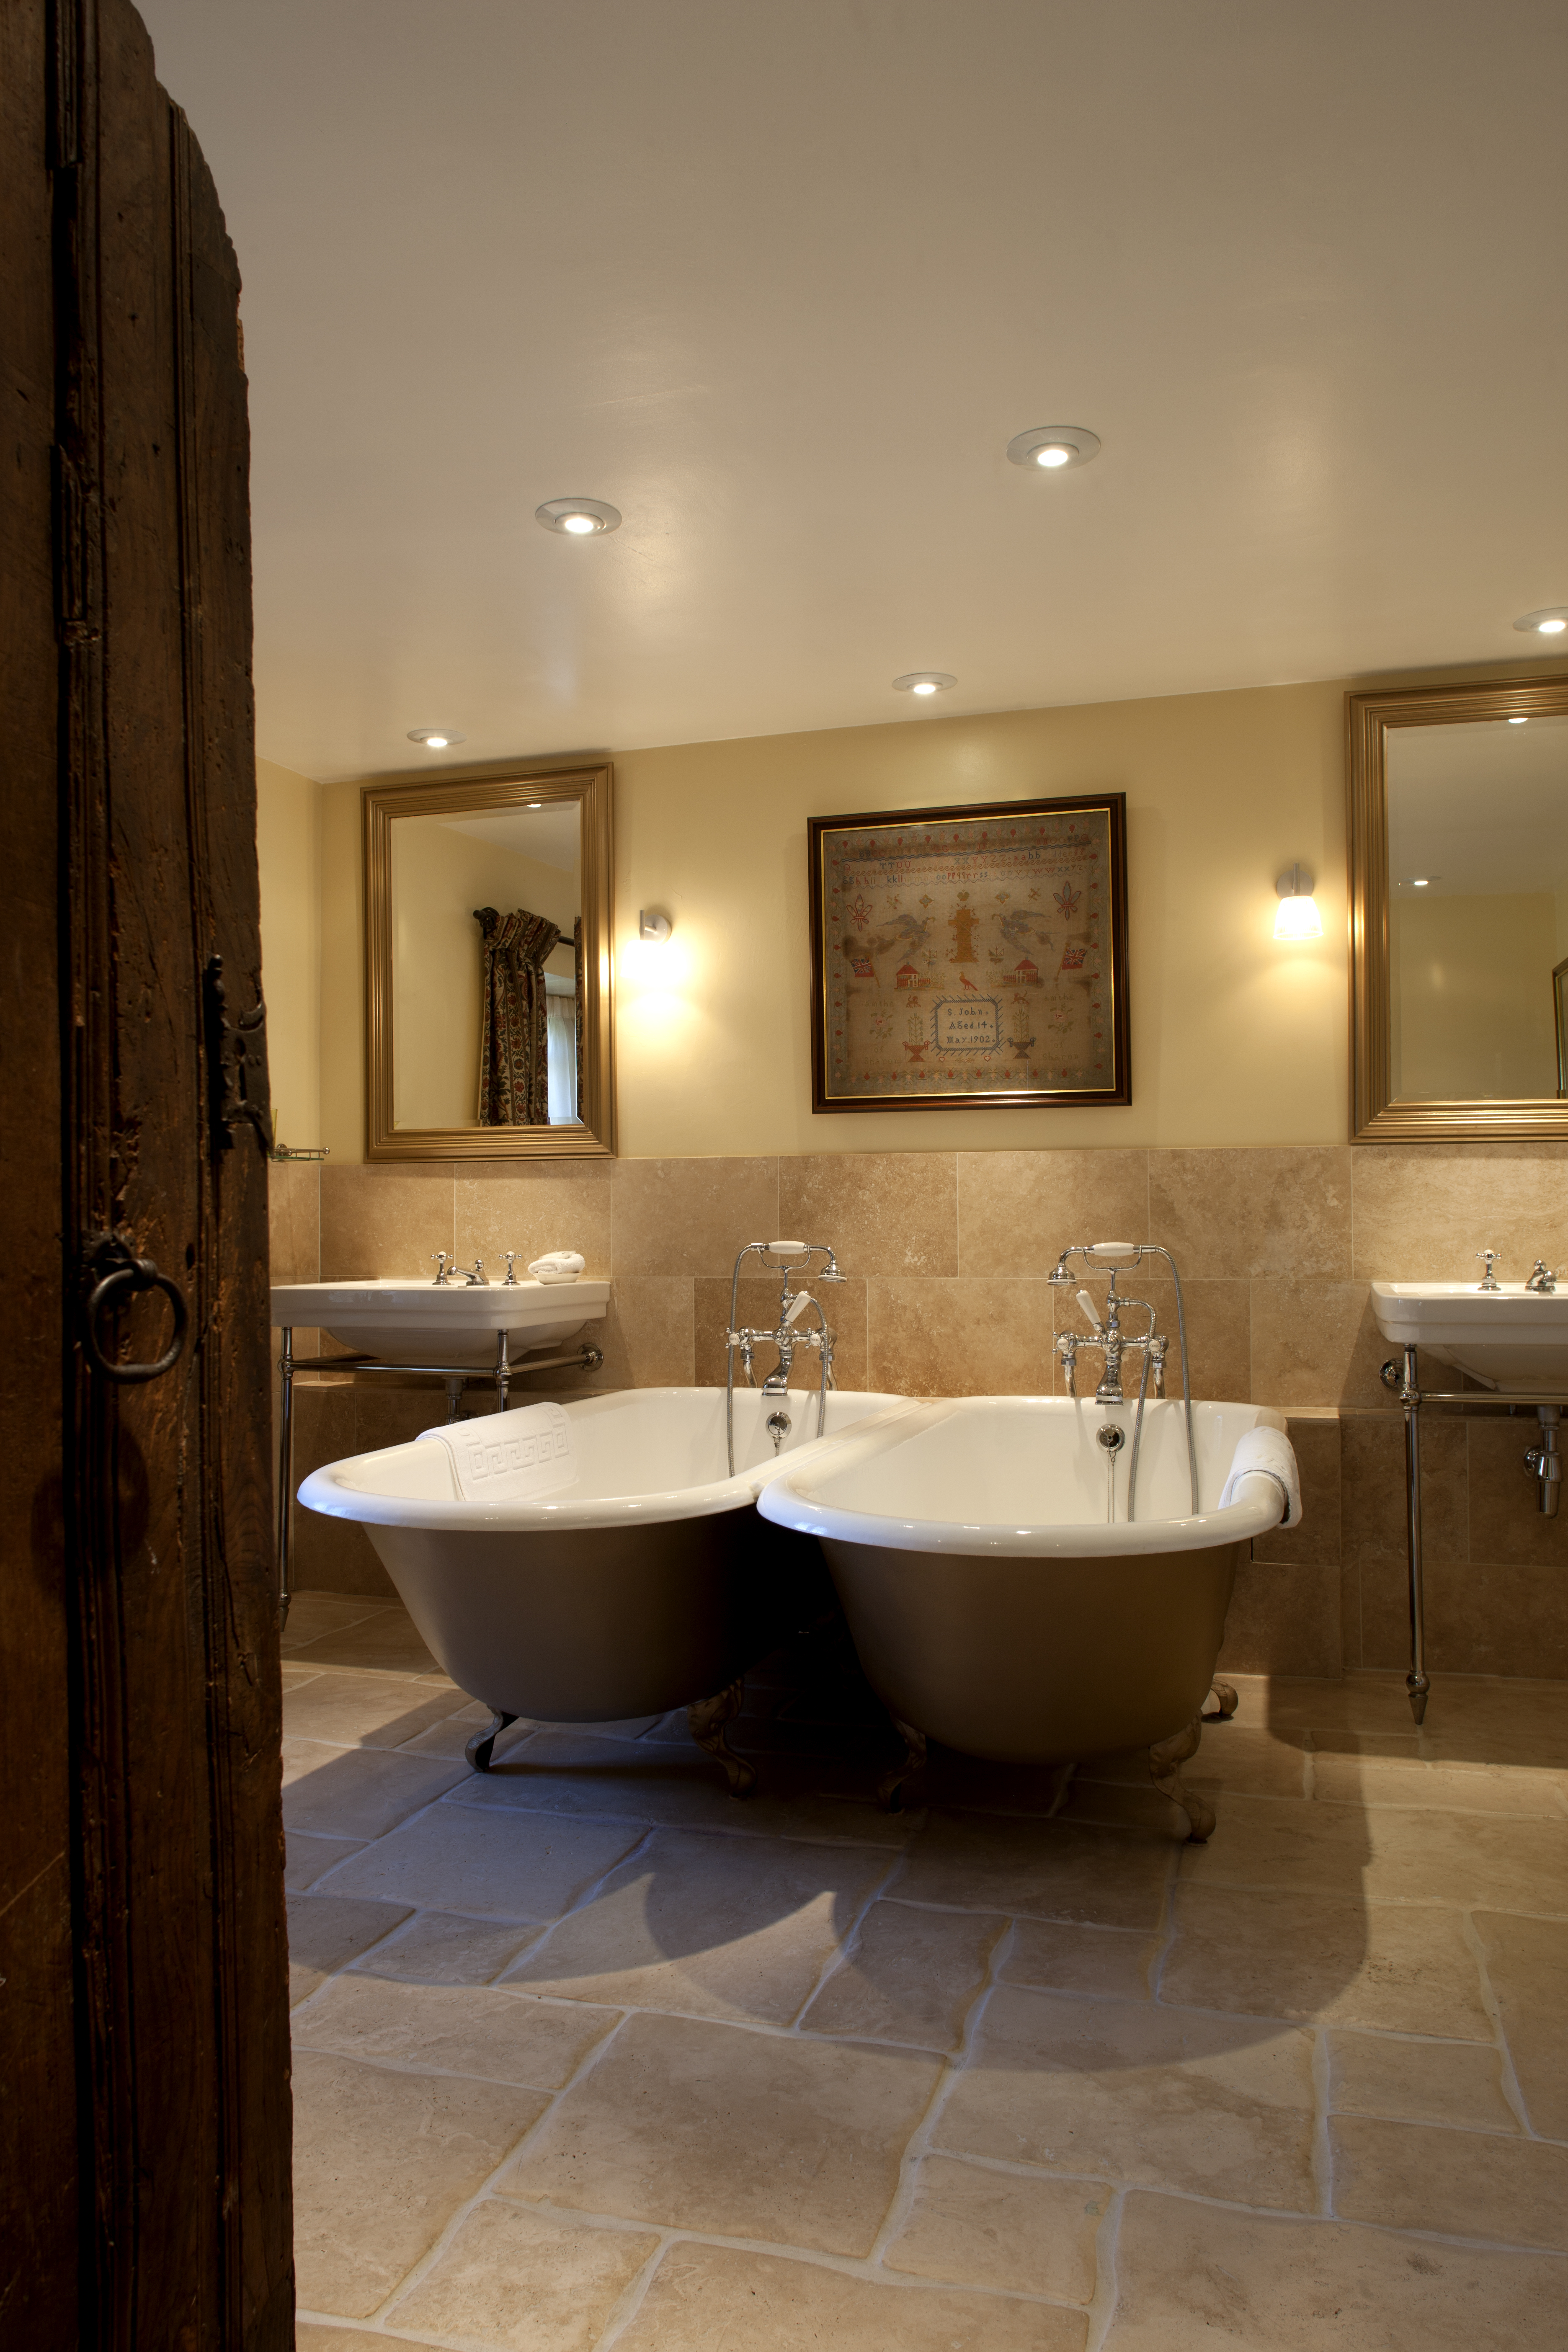 Bailiffscourt Hotel bathroom